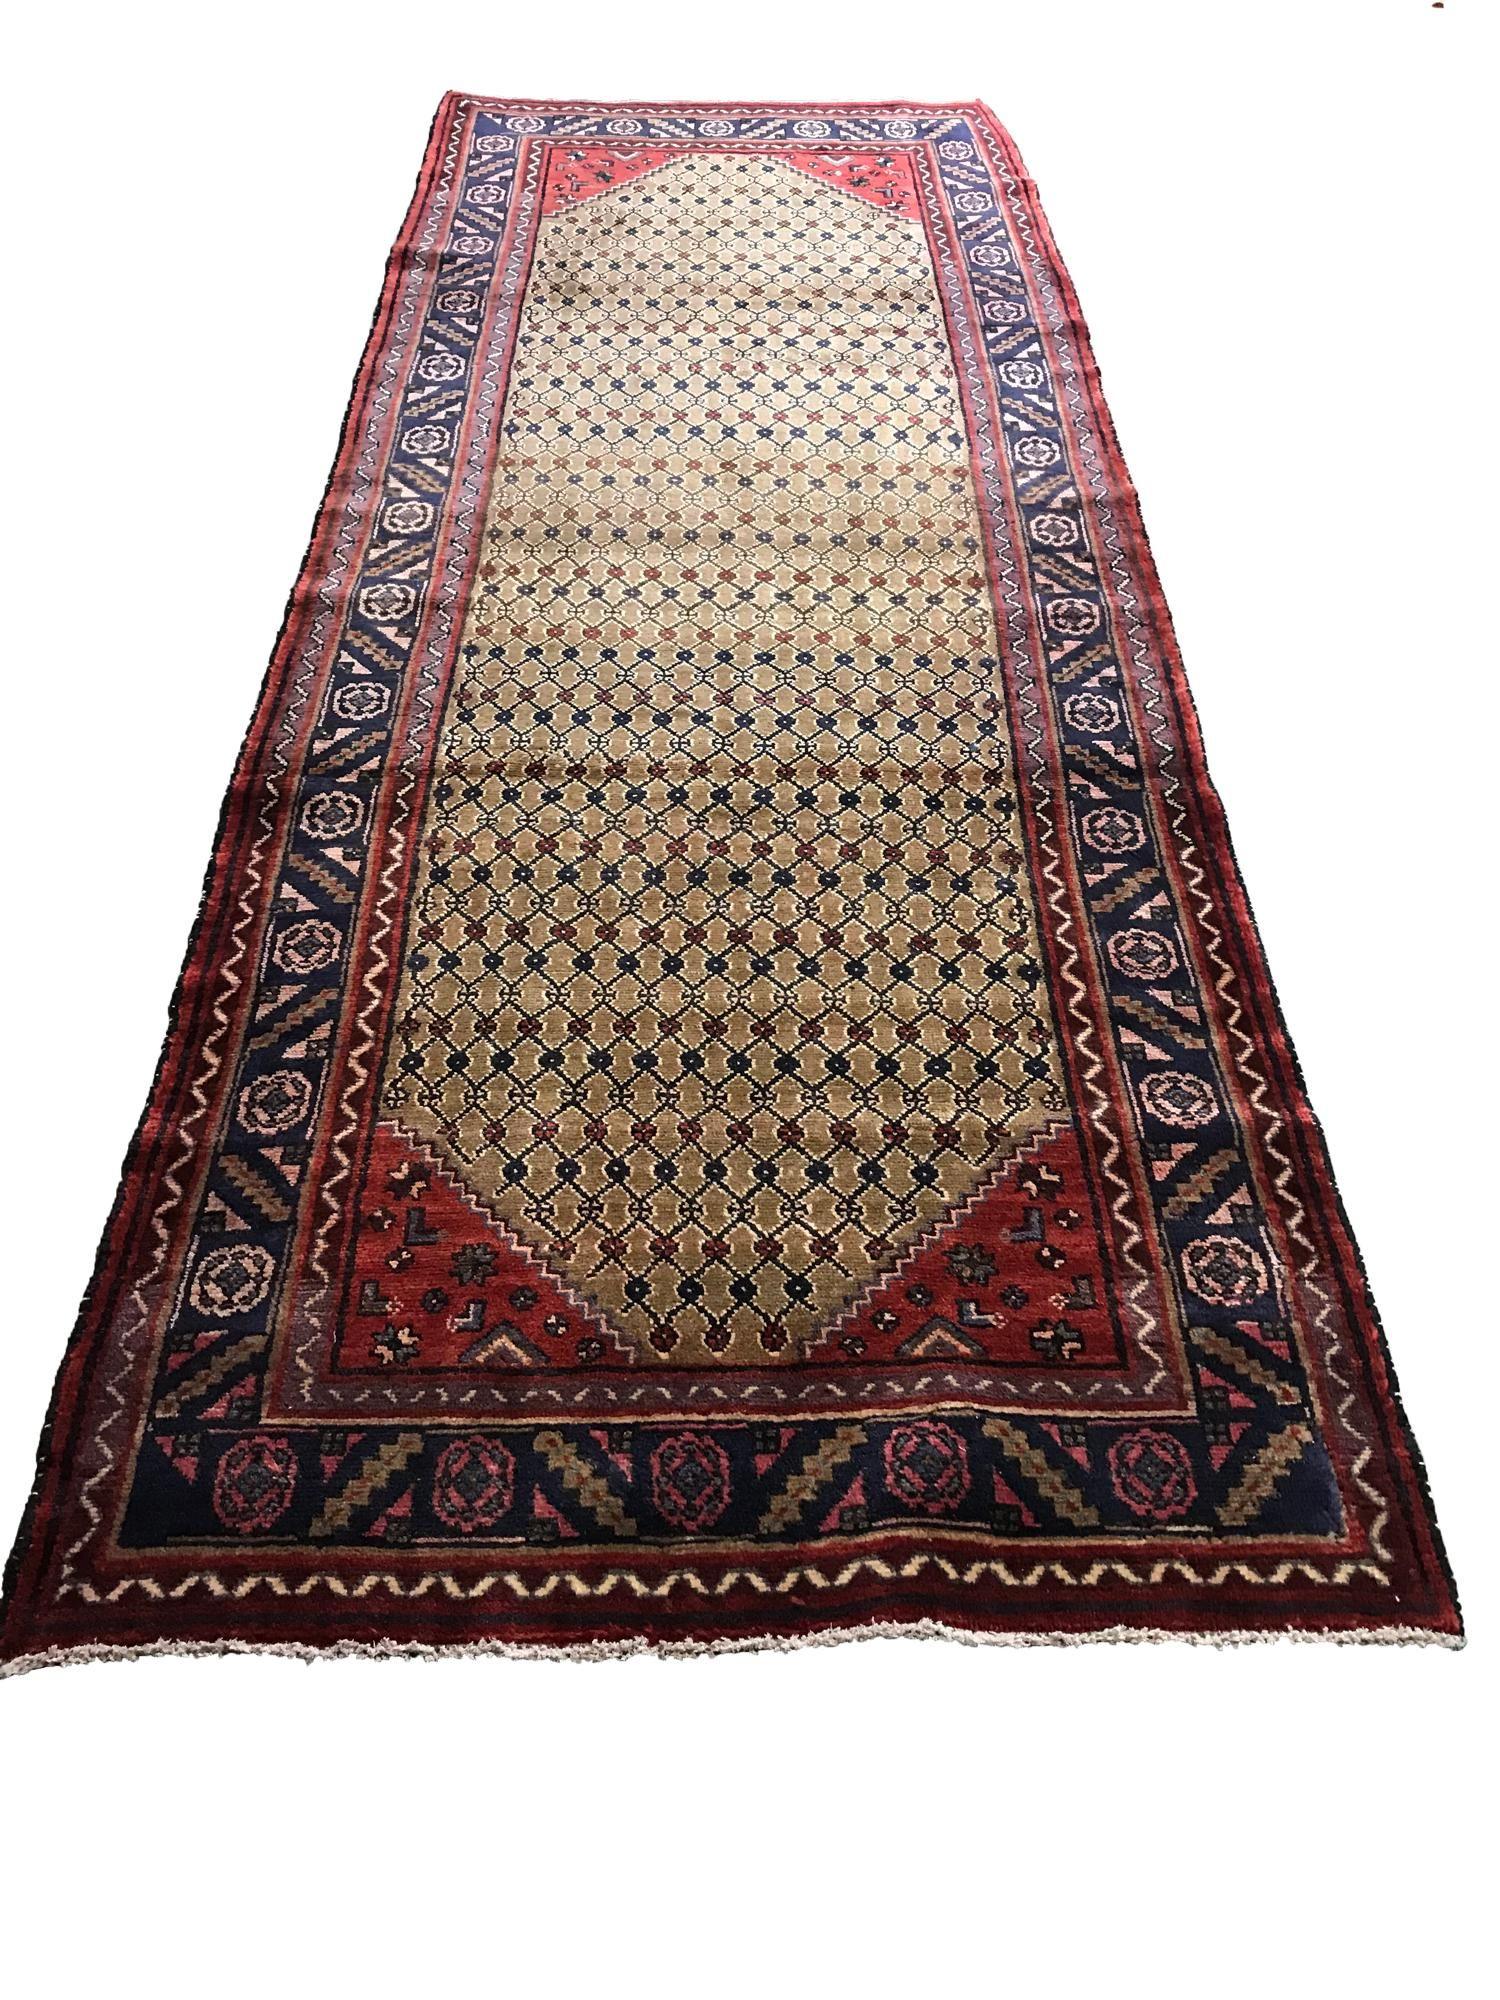 Persian tabriz mo344/584 rug wool pile vintage hand